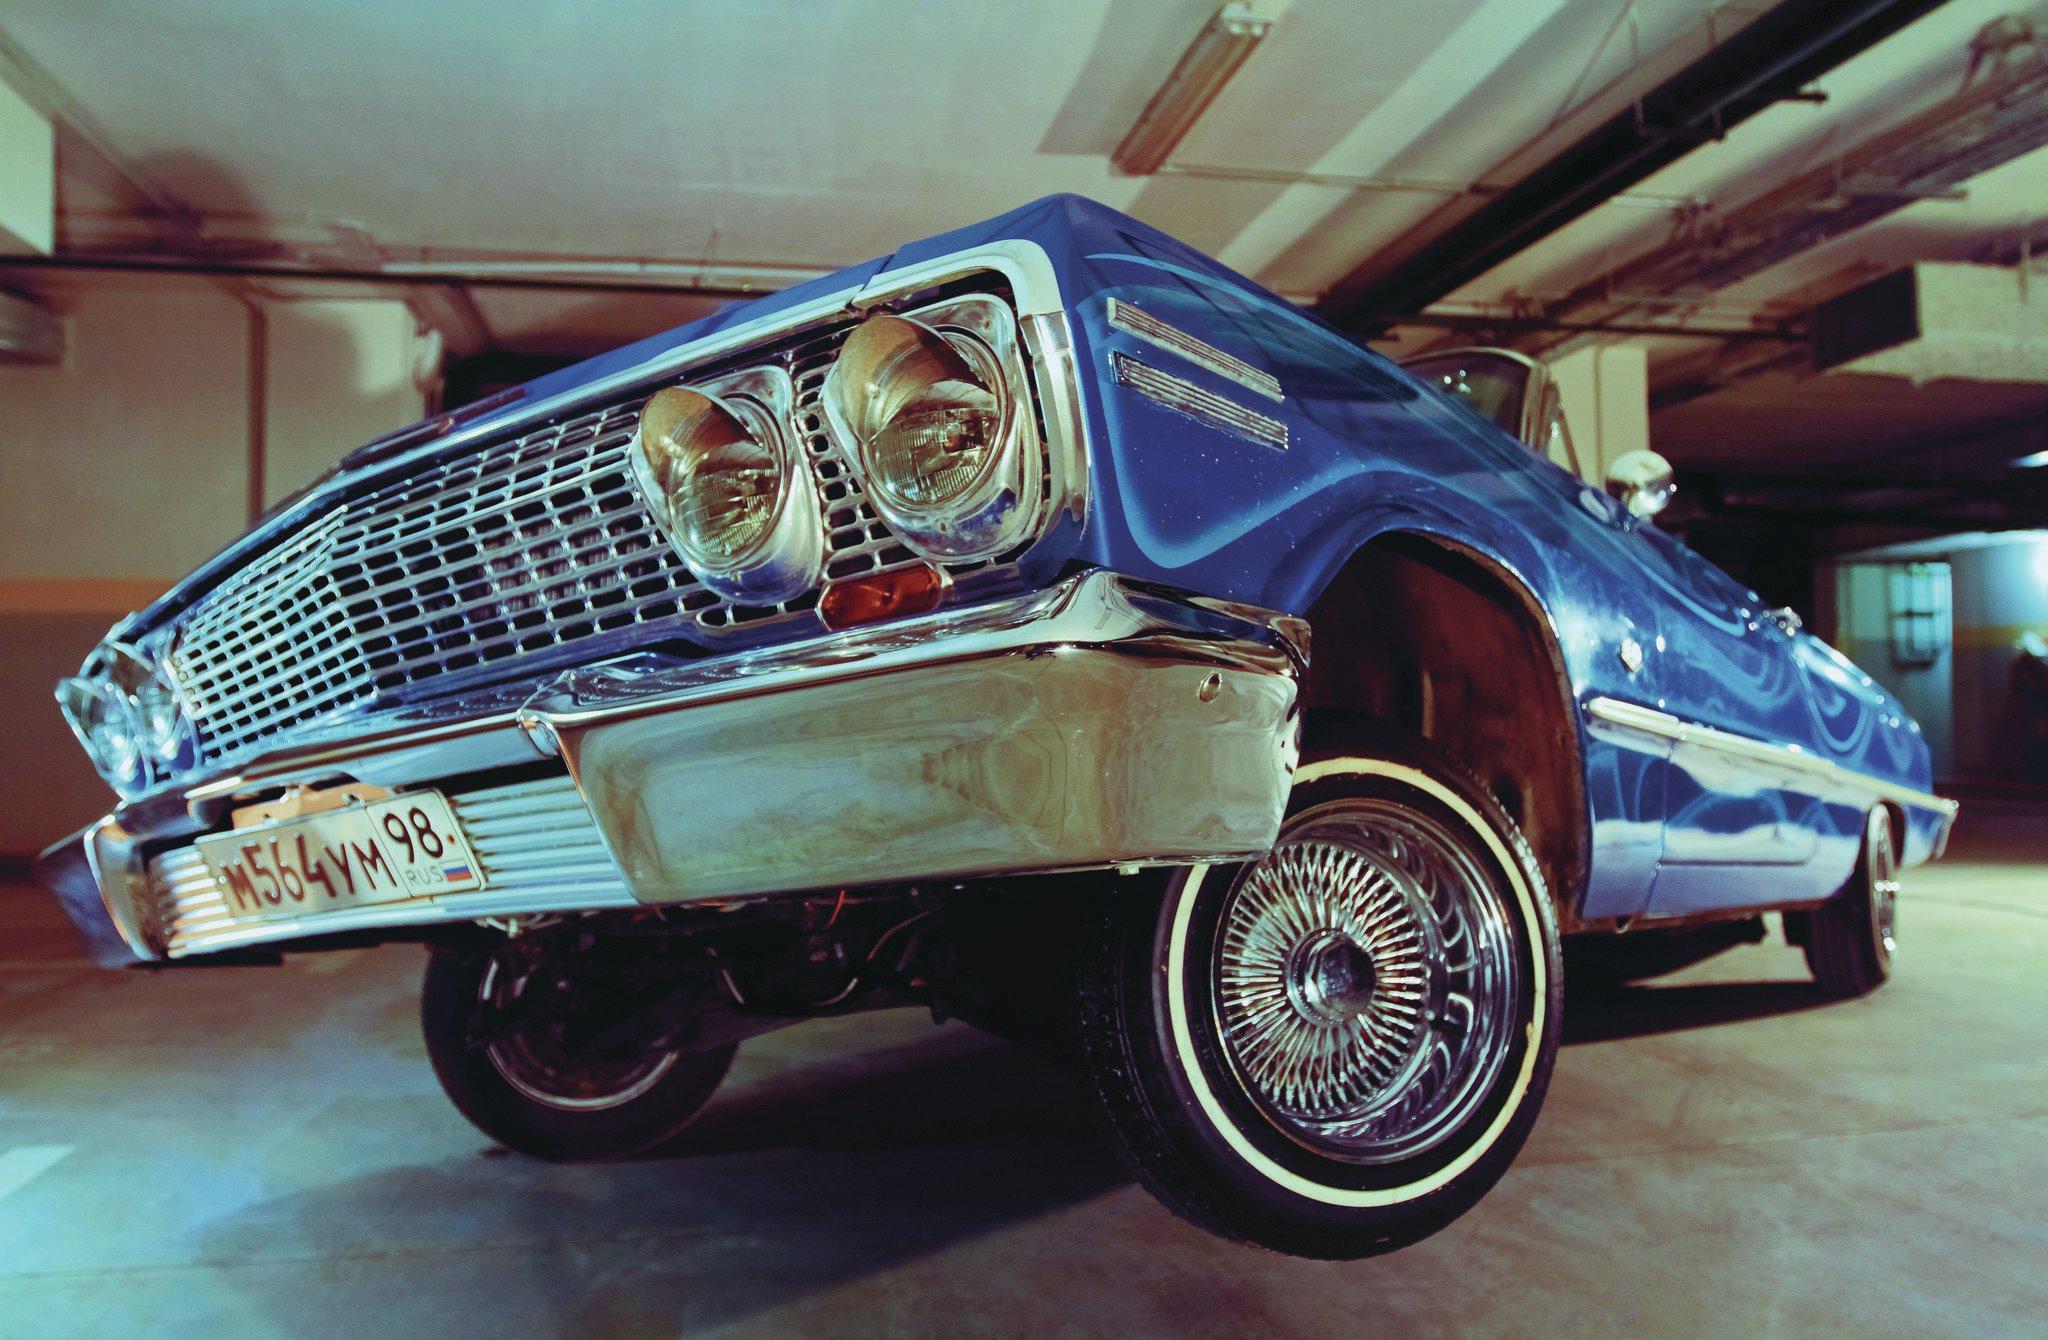 1963 Chevrolet Impala Ss A Shot Of Blue Vodka